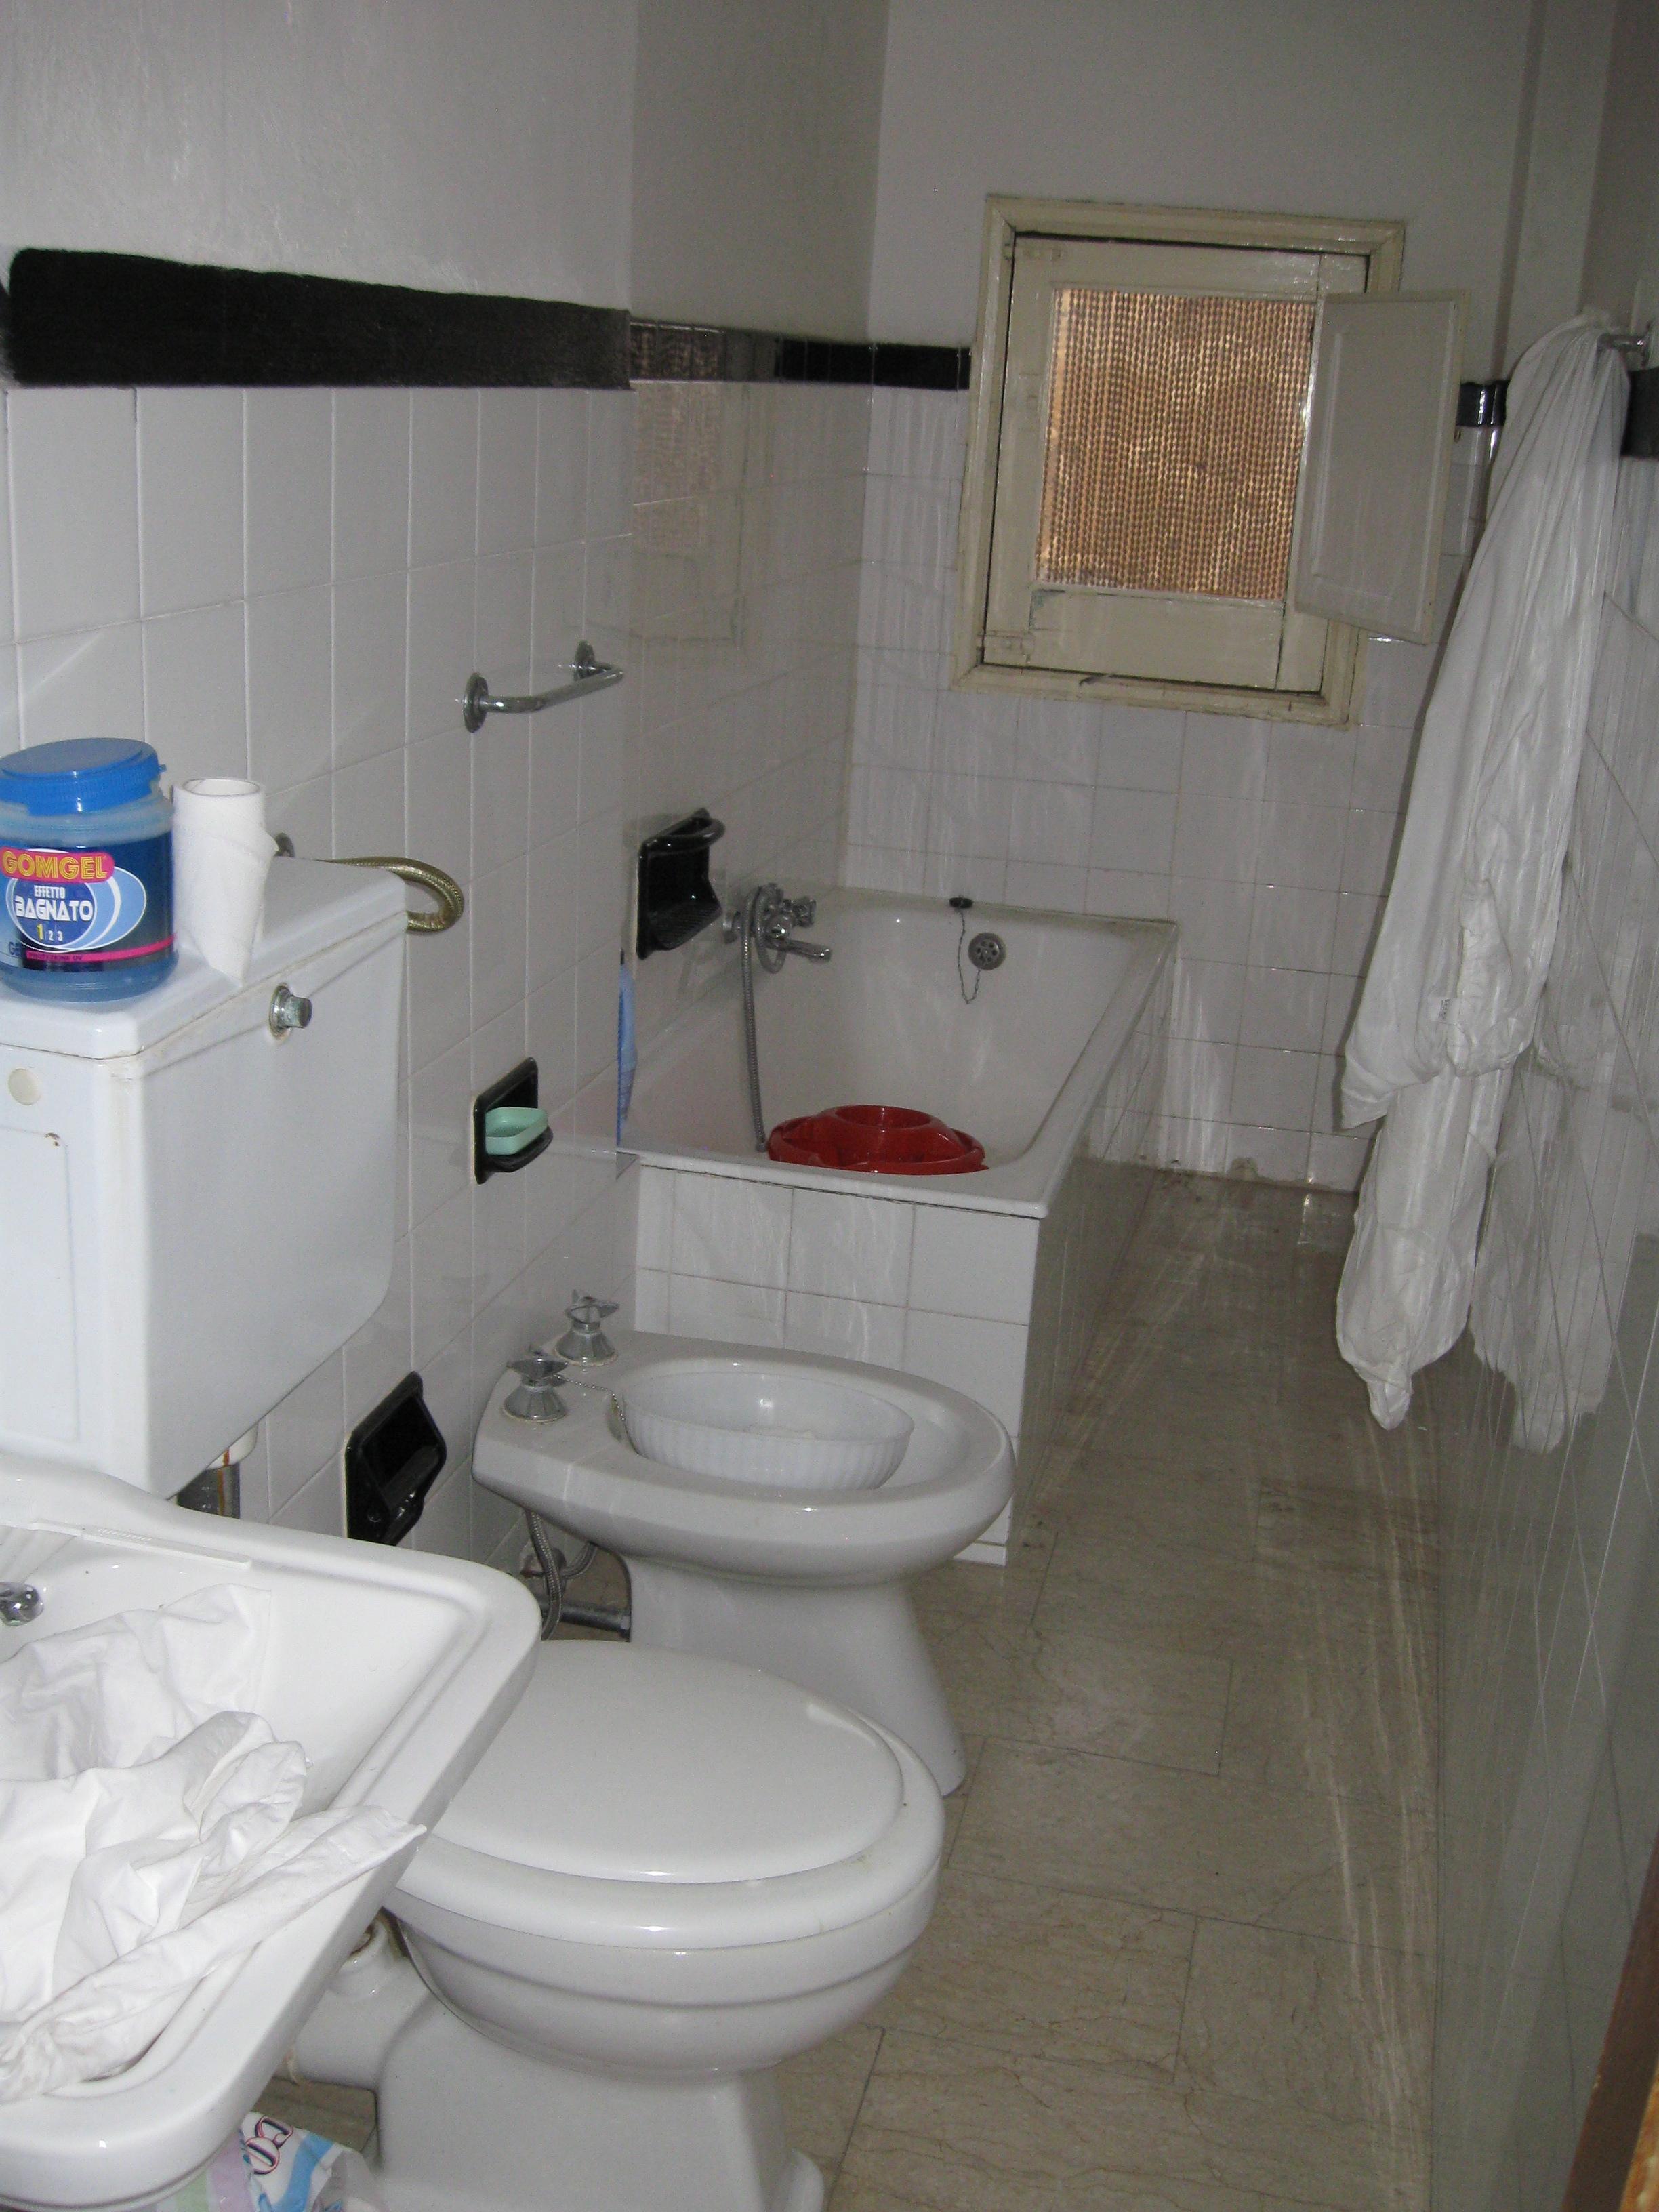 toilet ebay sprayer india spray layout bidet bathroom hose bath singapore